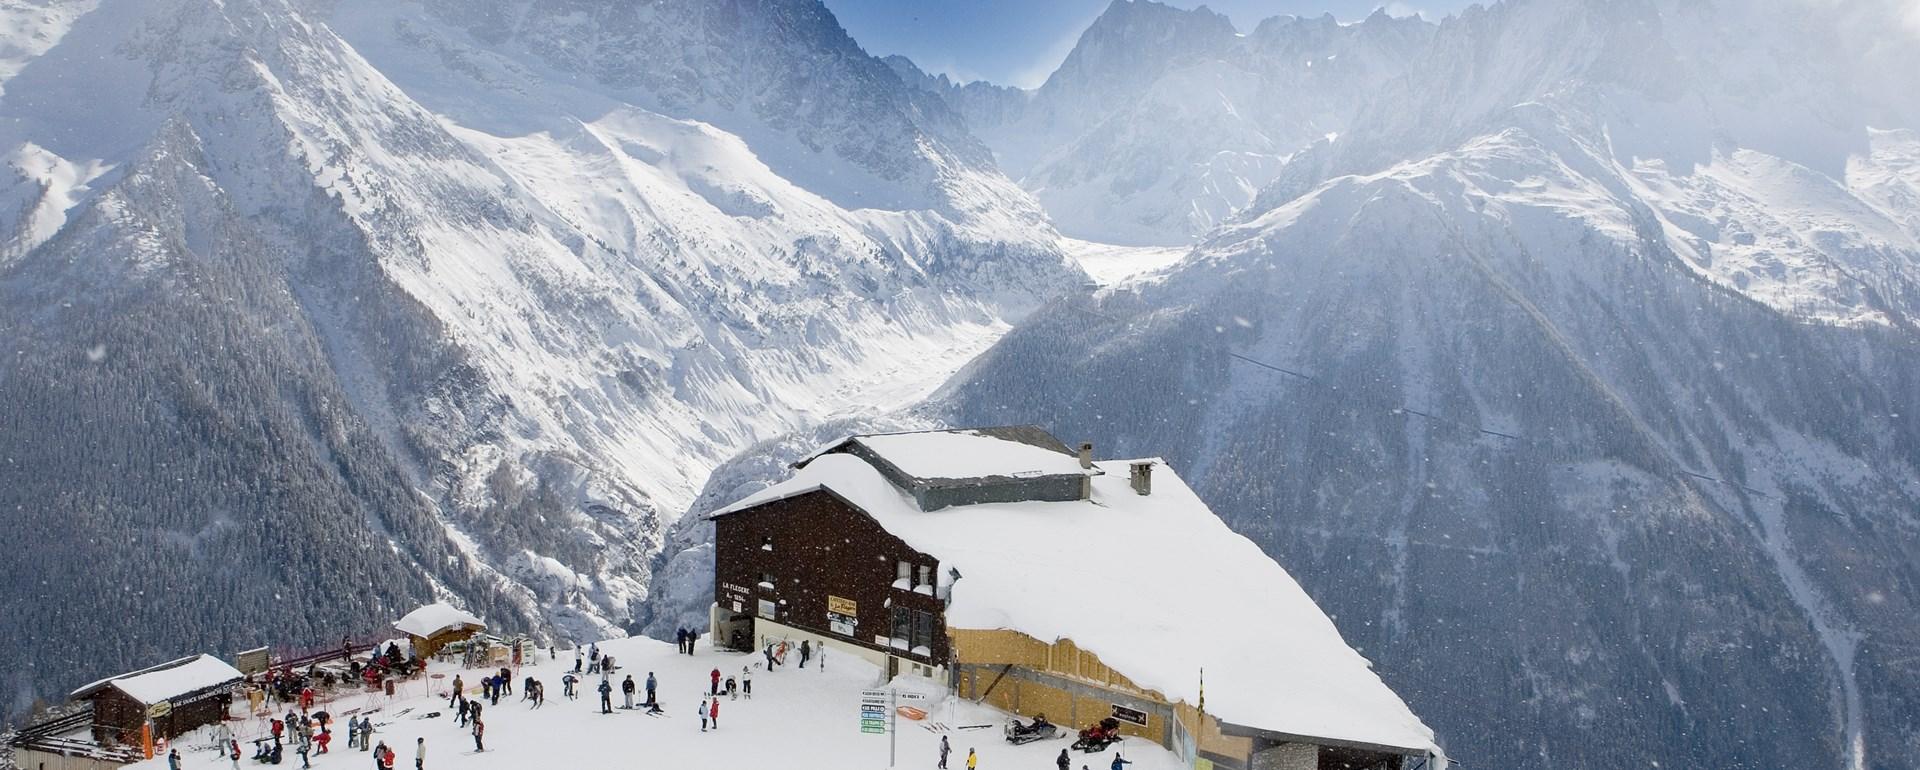 mont blanc chamonix skiing holidays | peak retreats ski apartment